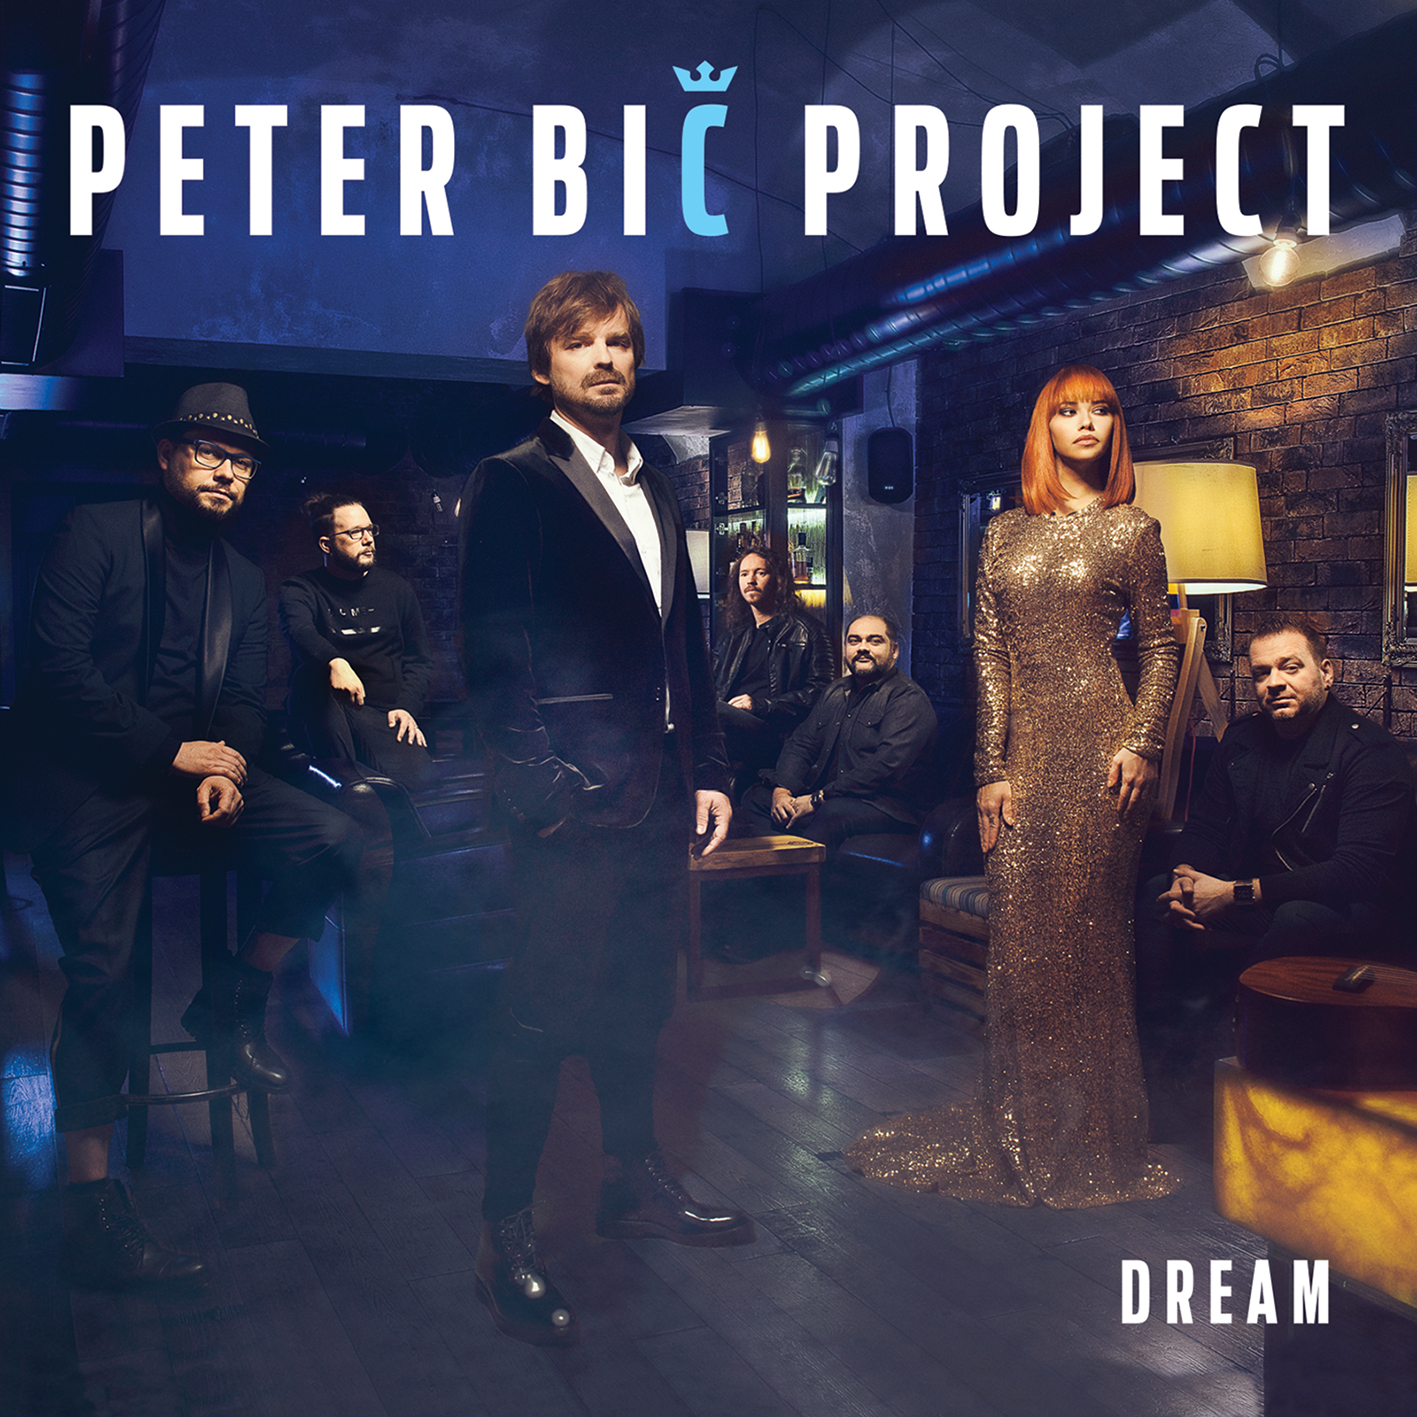 CD Shop - PETER BIC PROJECT DREAM